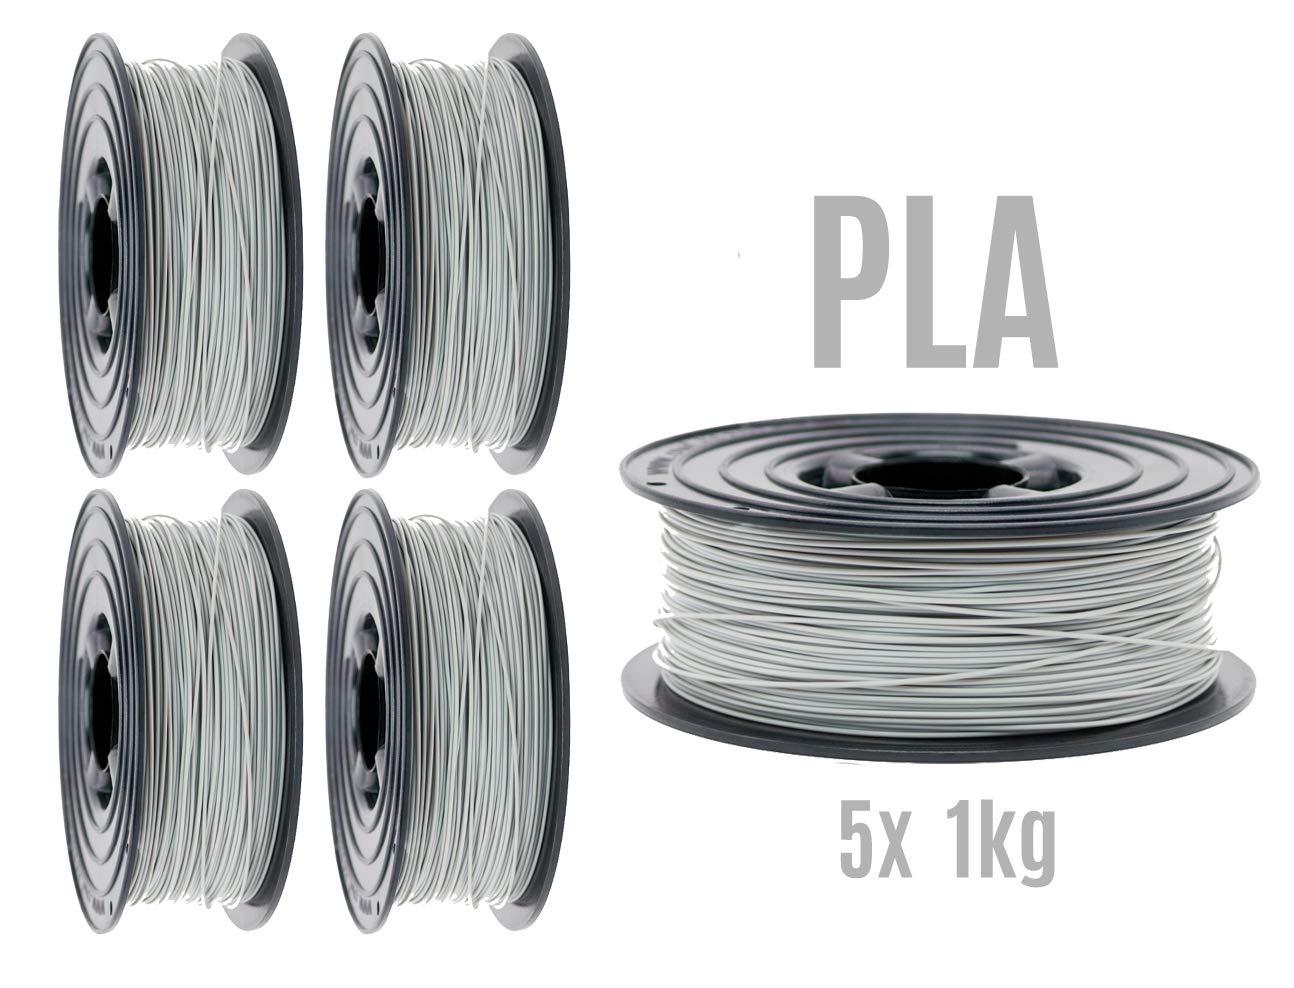 3kg // 1x 1kg Schwarz//Rot//Wei/ß OWL-Filament Premium 3D PLA Filament 1kg 1,75mm Made in Germany